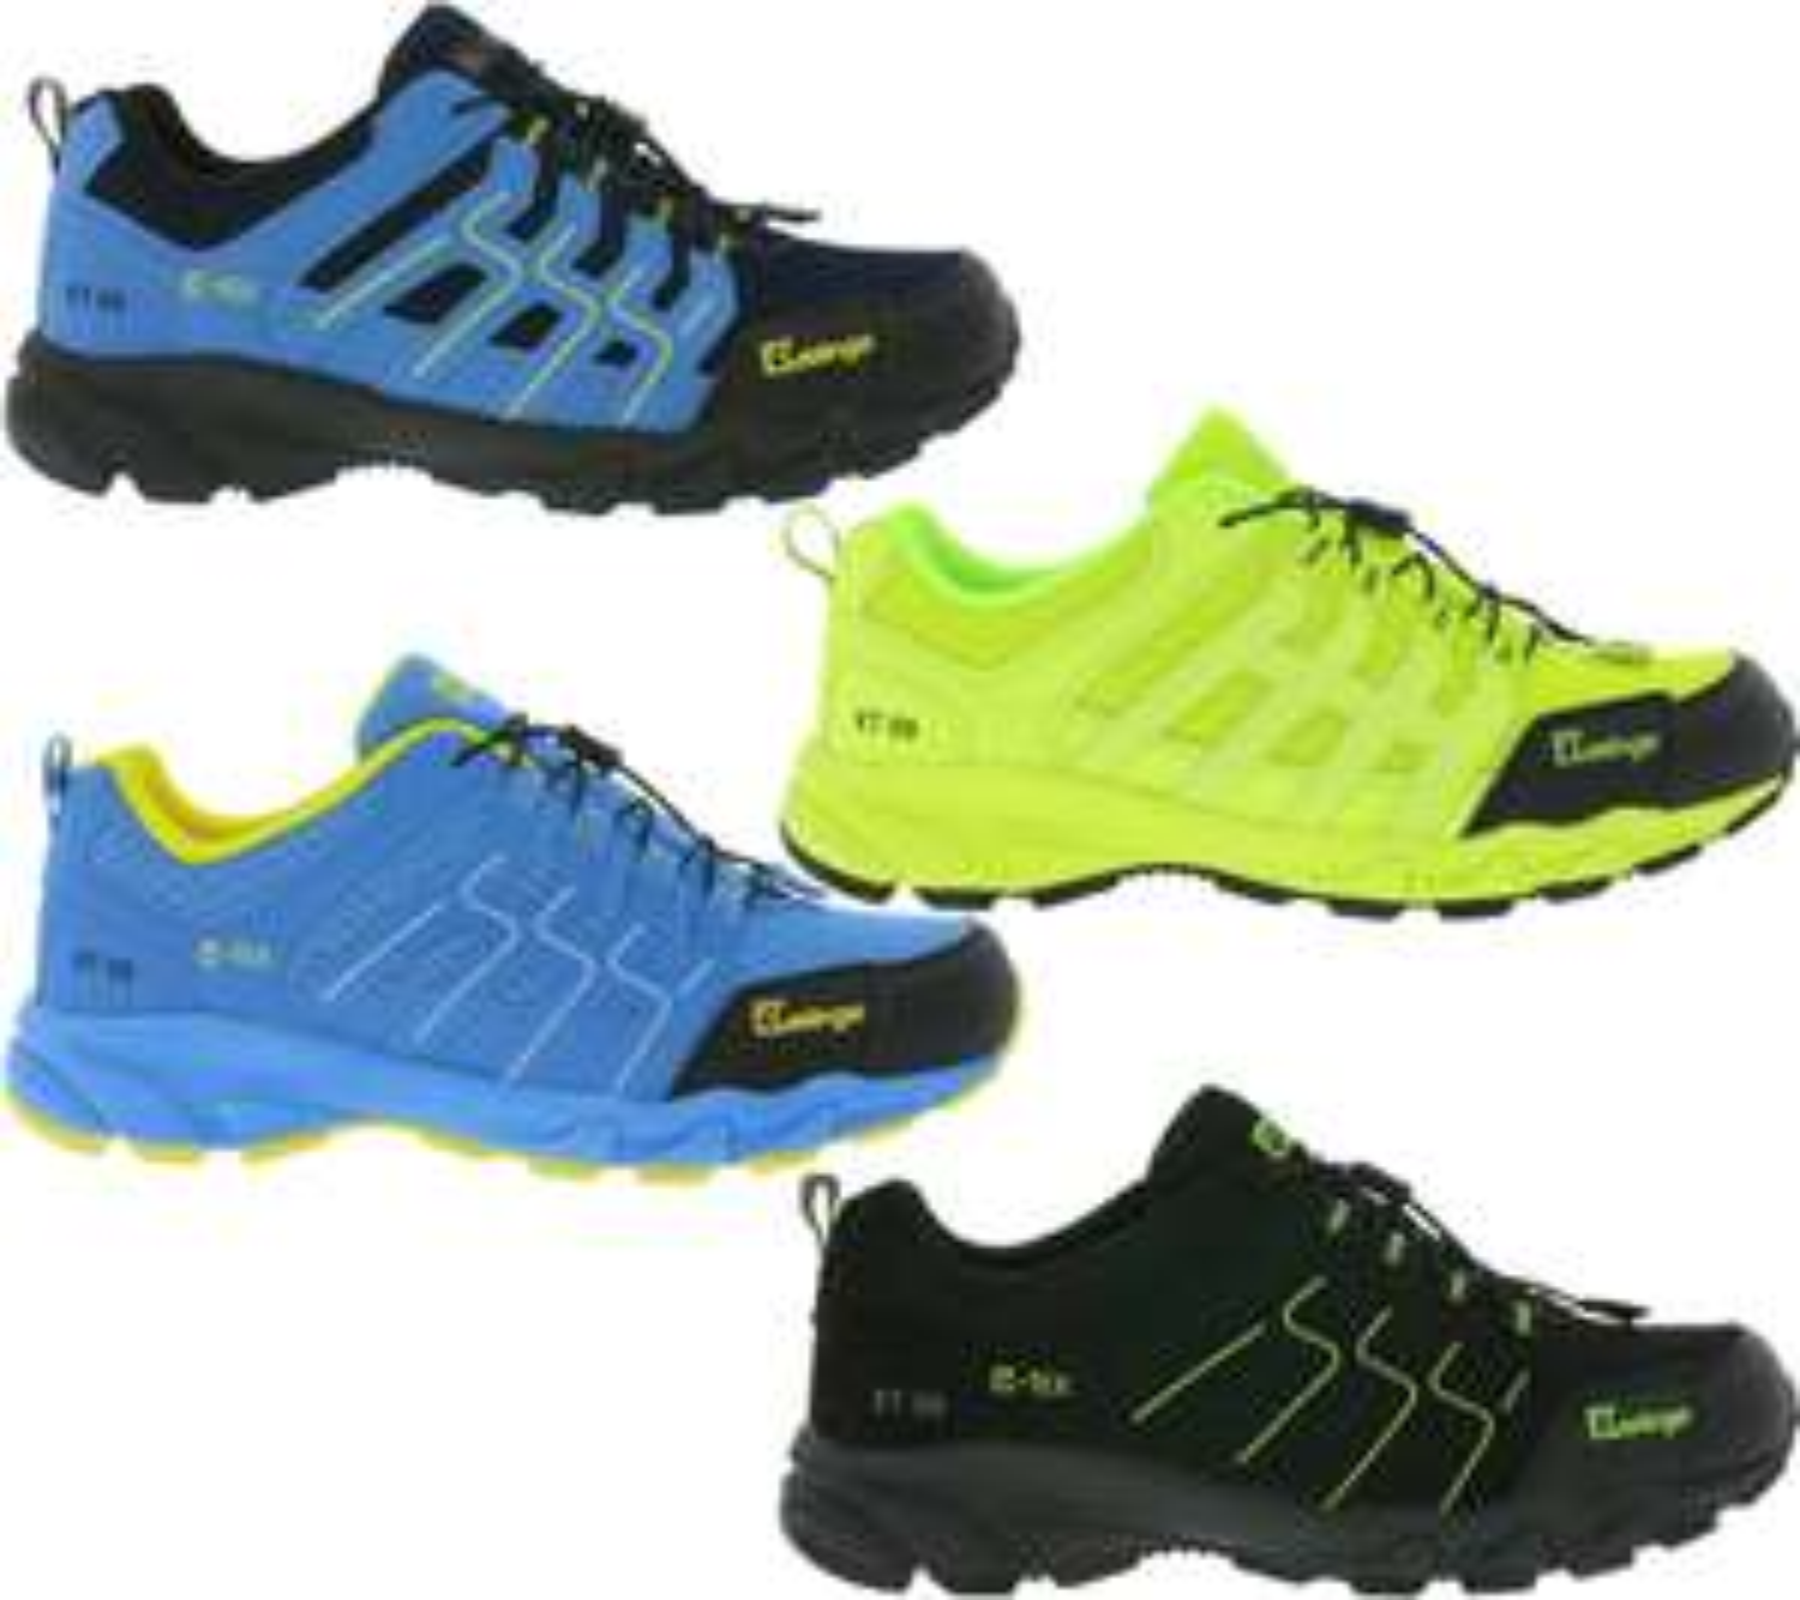 Kastinger Schuhe für 29,99€ statt 59,99€ Ink. Versand - Outlet46